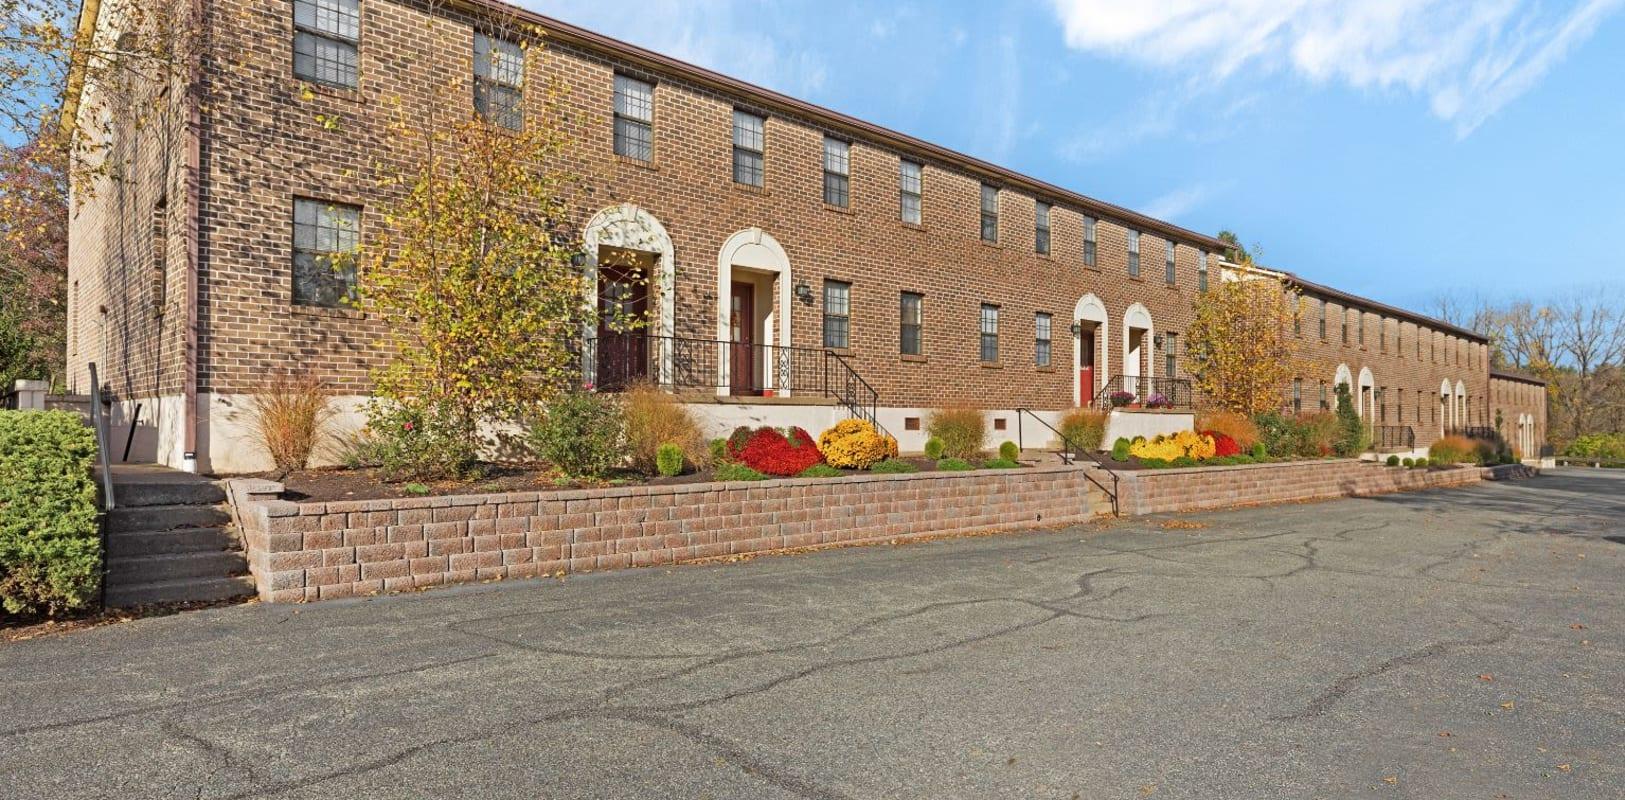 Brick exterior of Bridle Path Apartments in Bethlehem, Pennsylvania